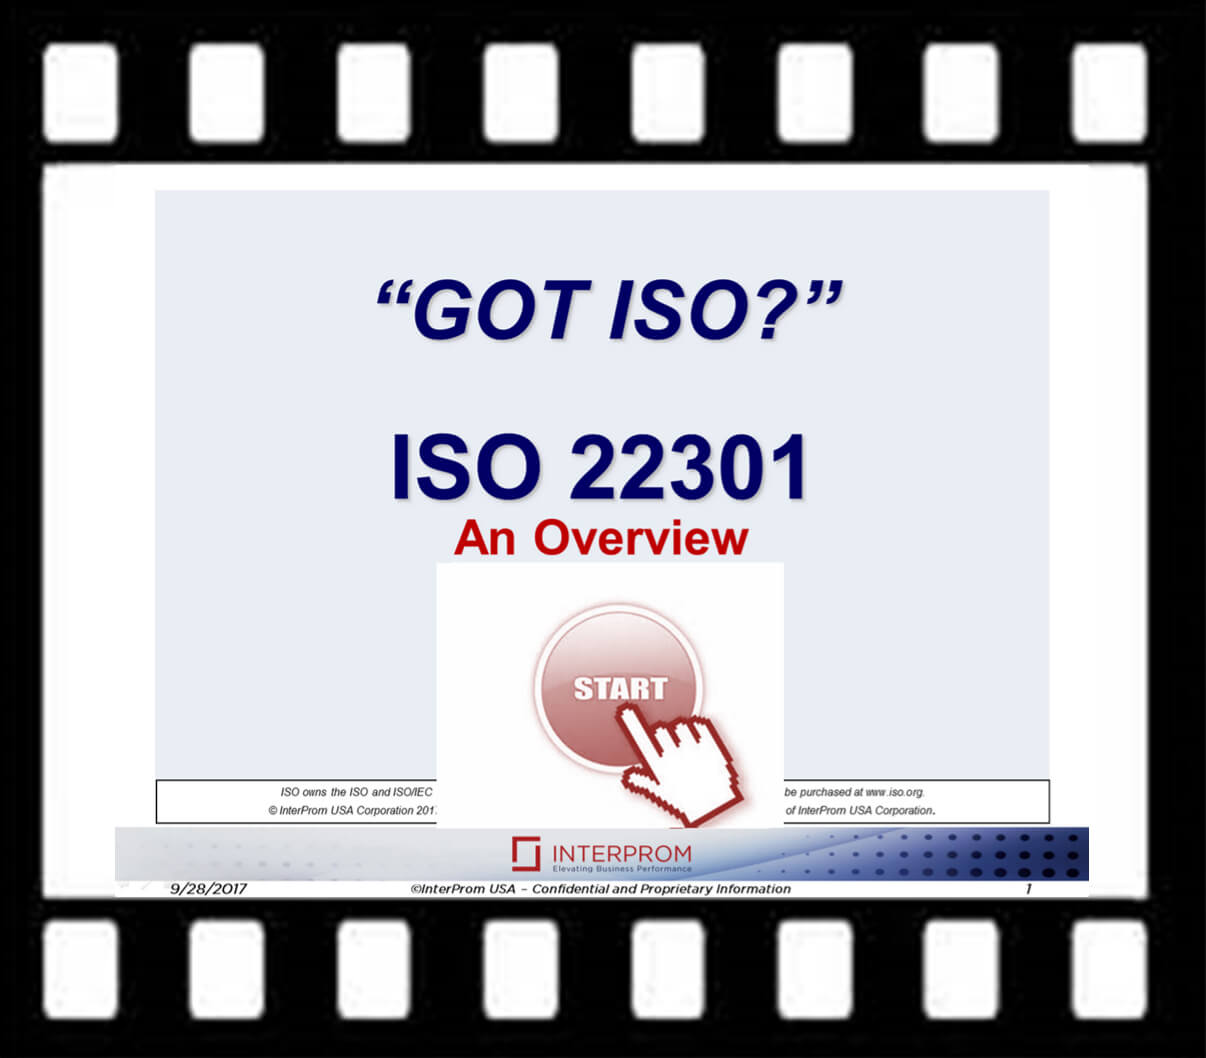 GOT ISO 22301 Overview Webinar Recording